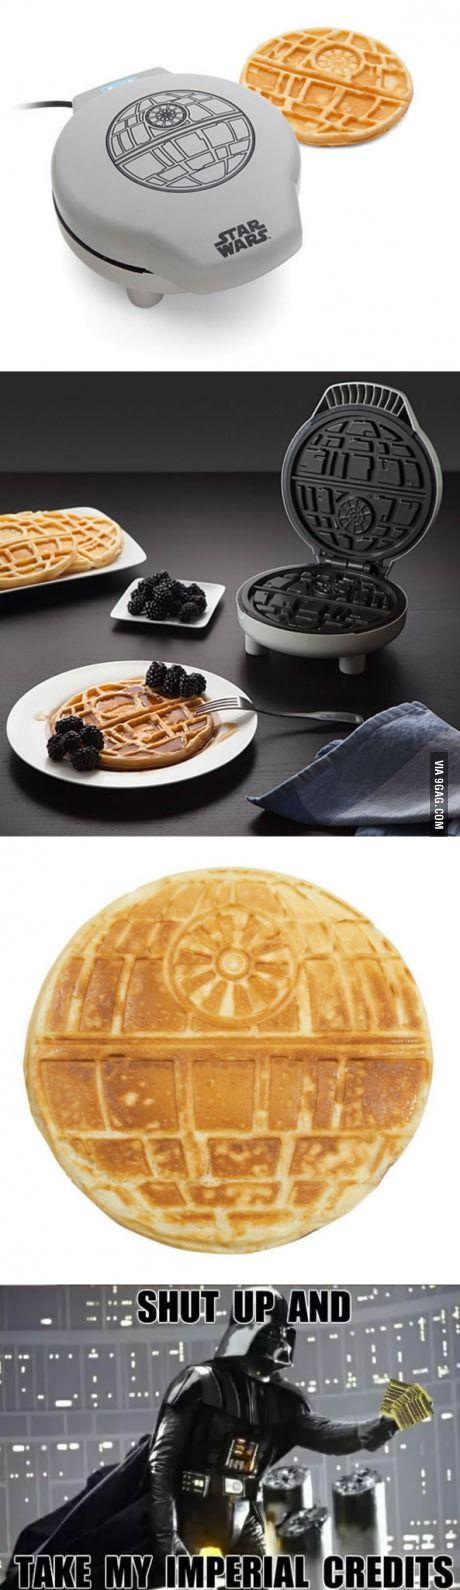 Star Wars Waffle Maker That Bakes Death Stars For Breakfast